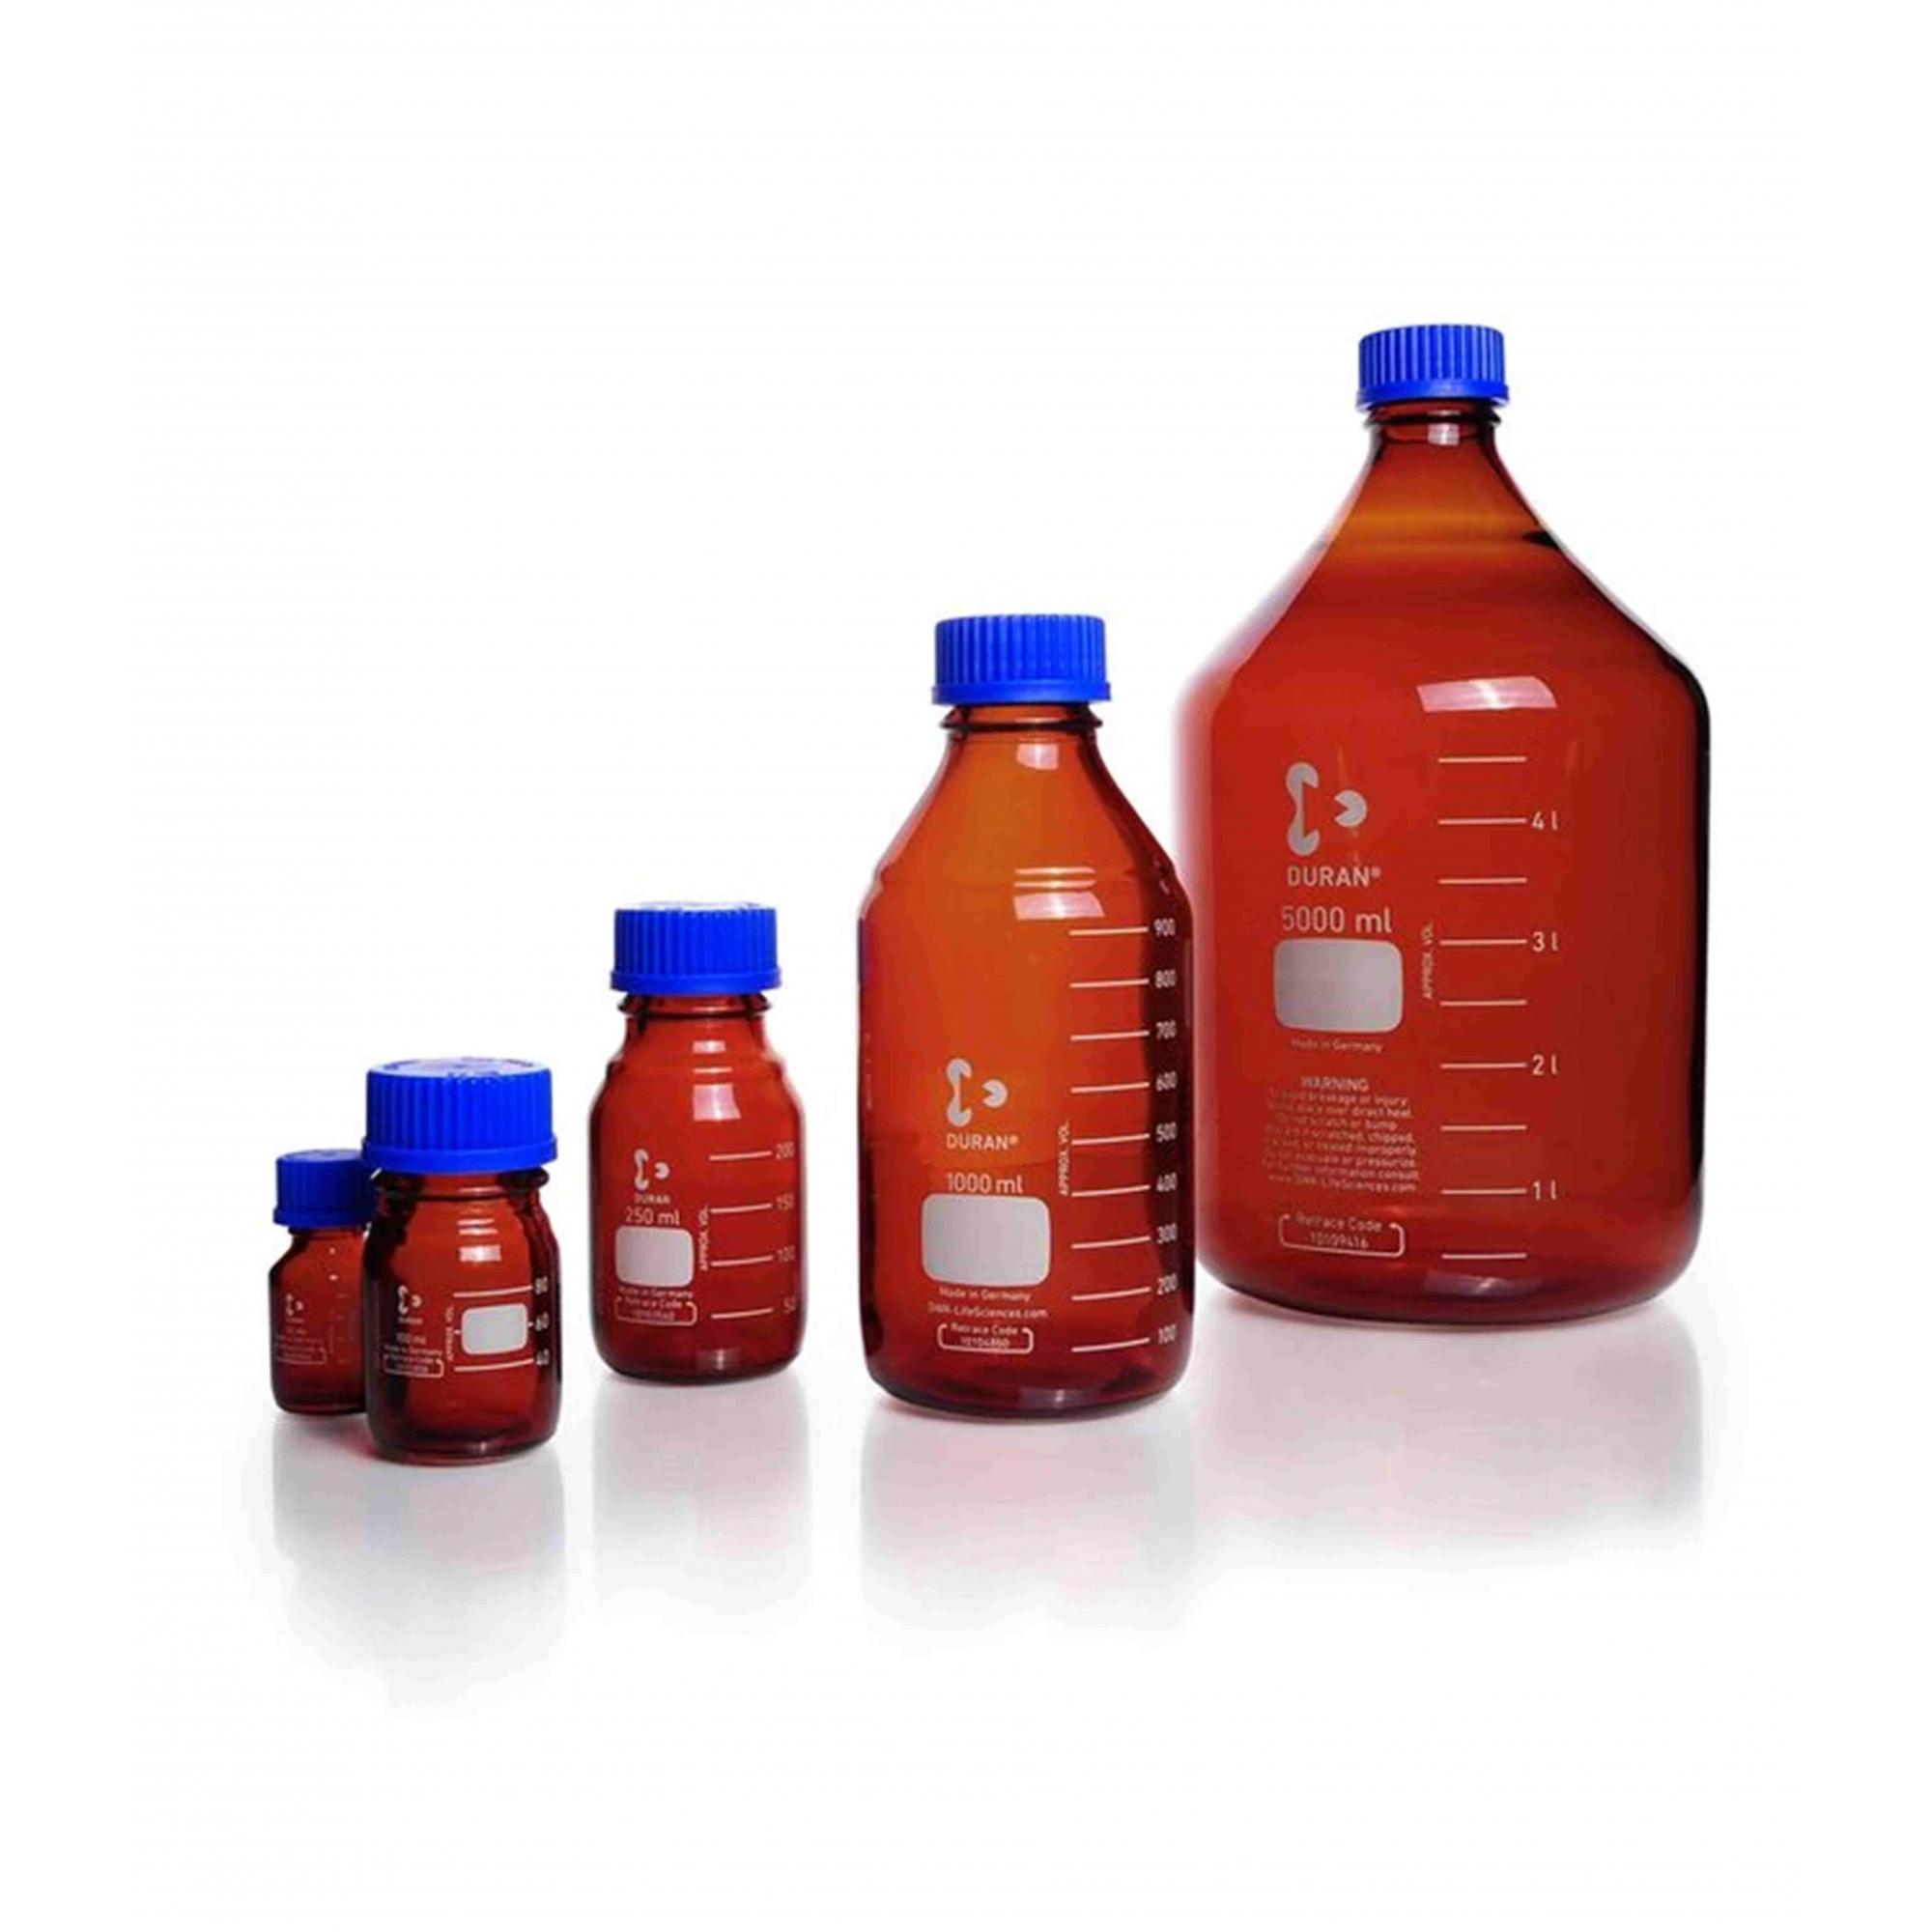 Frasco Reagente Âmbar Tampa Azul 250 ml - Schott - Cód. 21806365